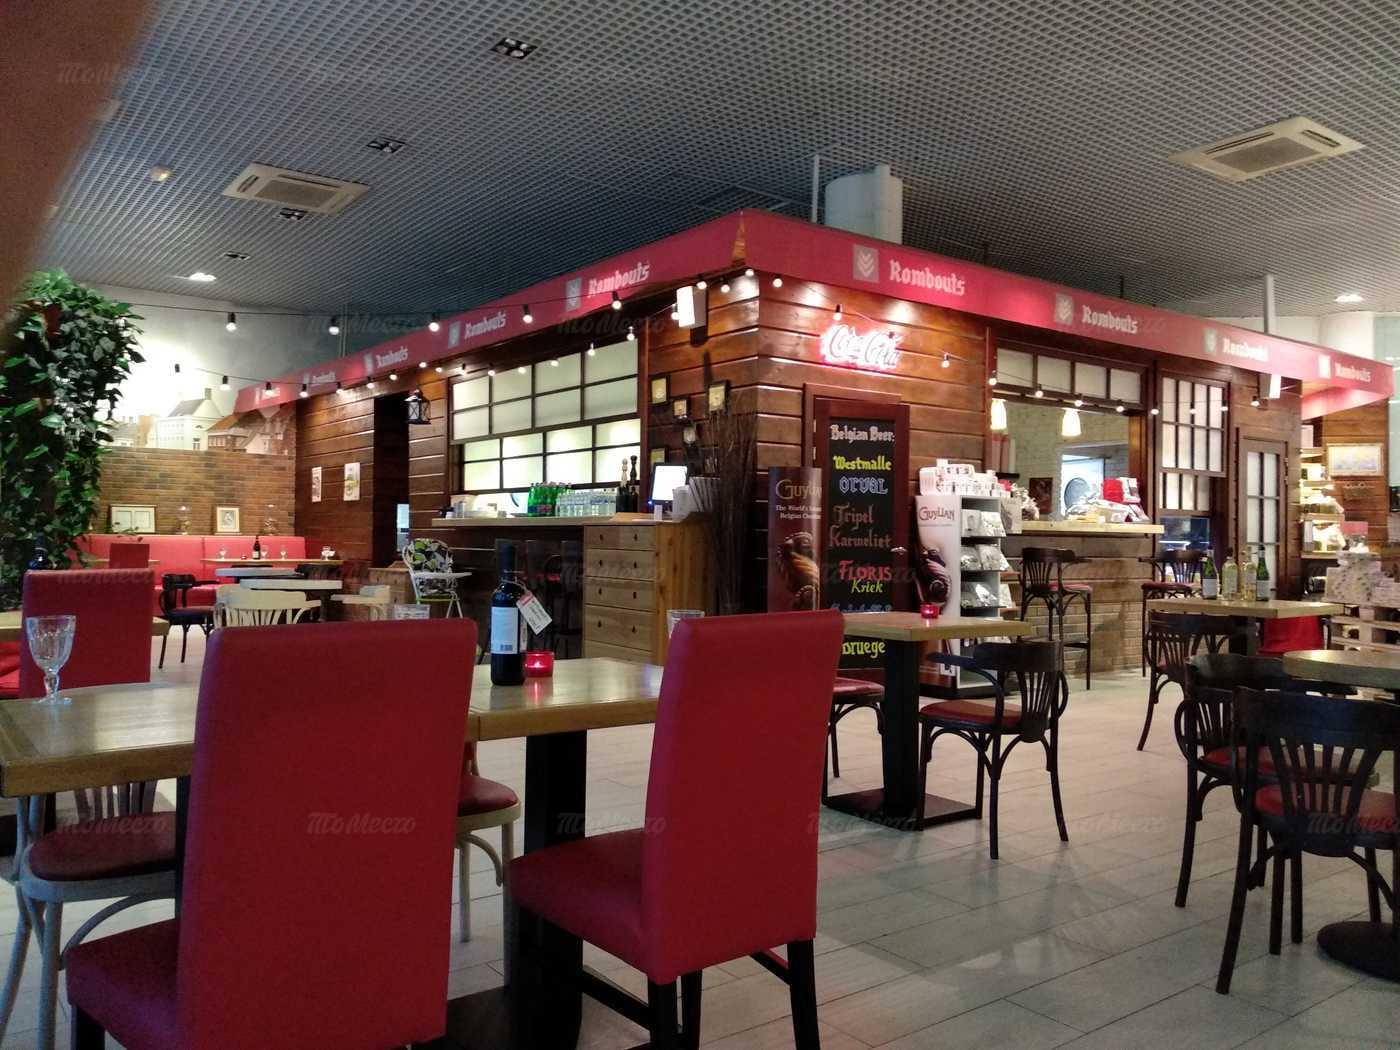 Кафе Rombouts (Ромбаутс) на Ходынском бульваре фото 4